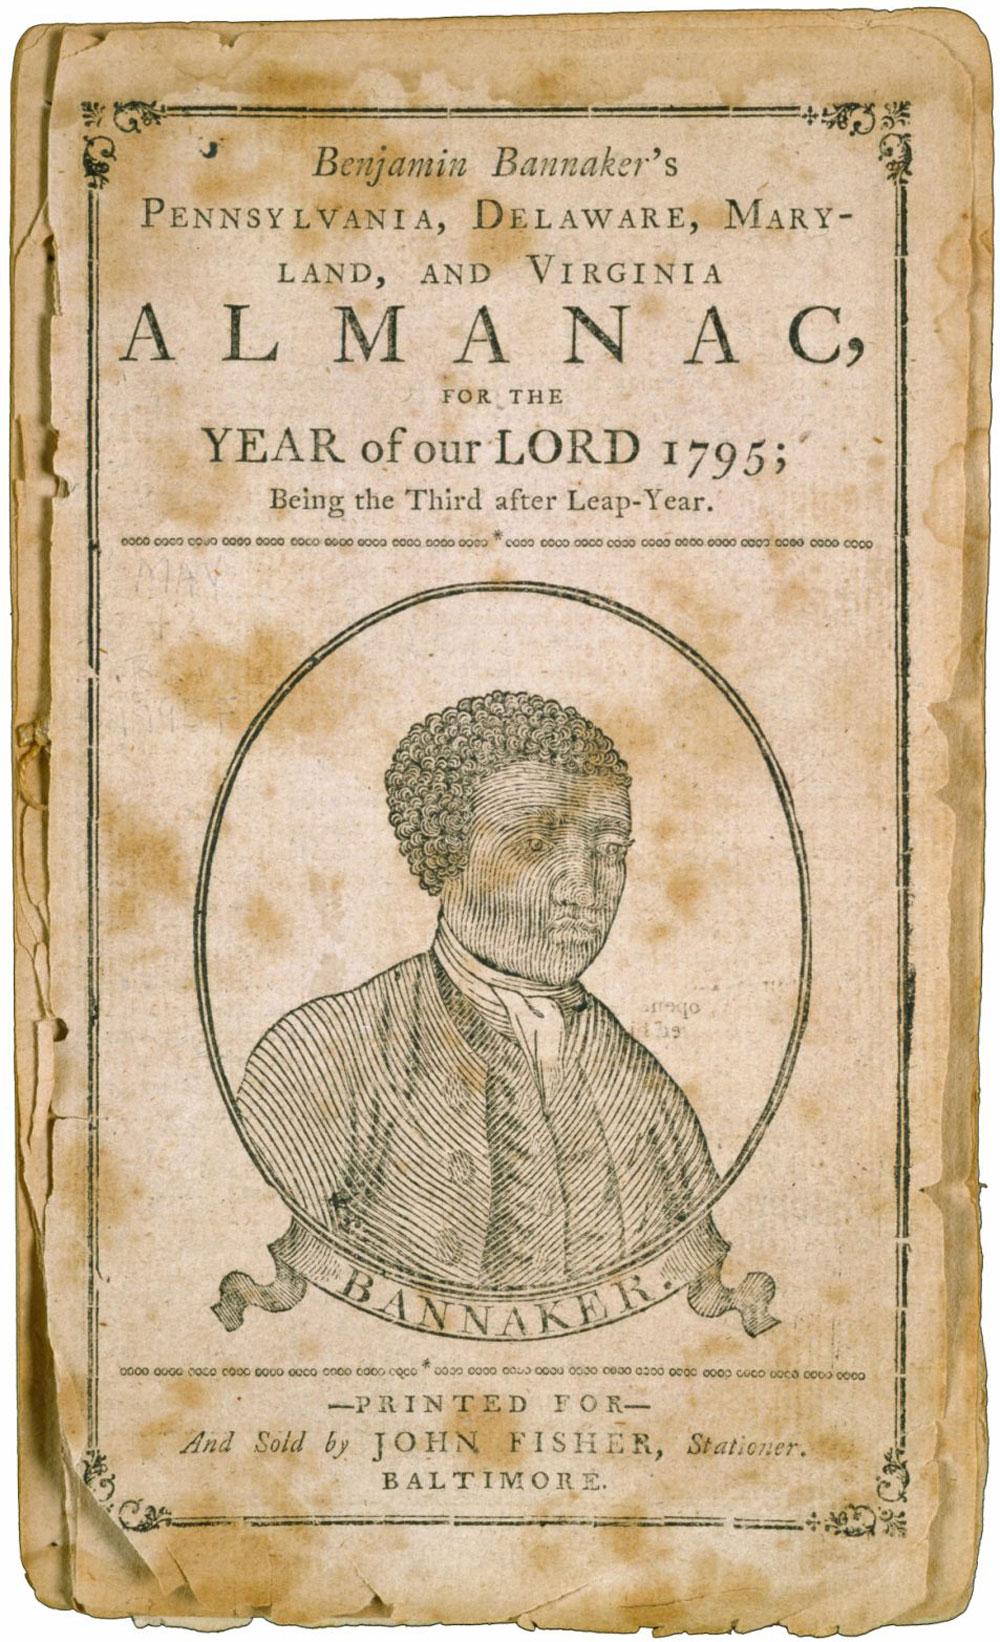 Benjamin Banneker's first almanac